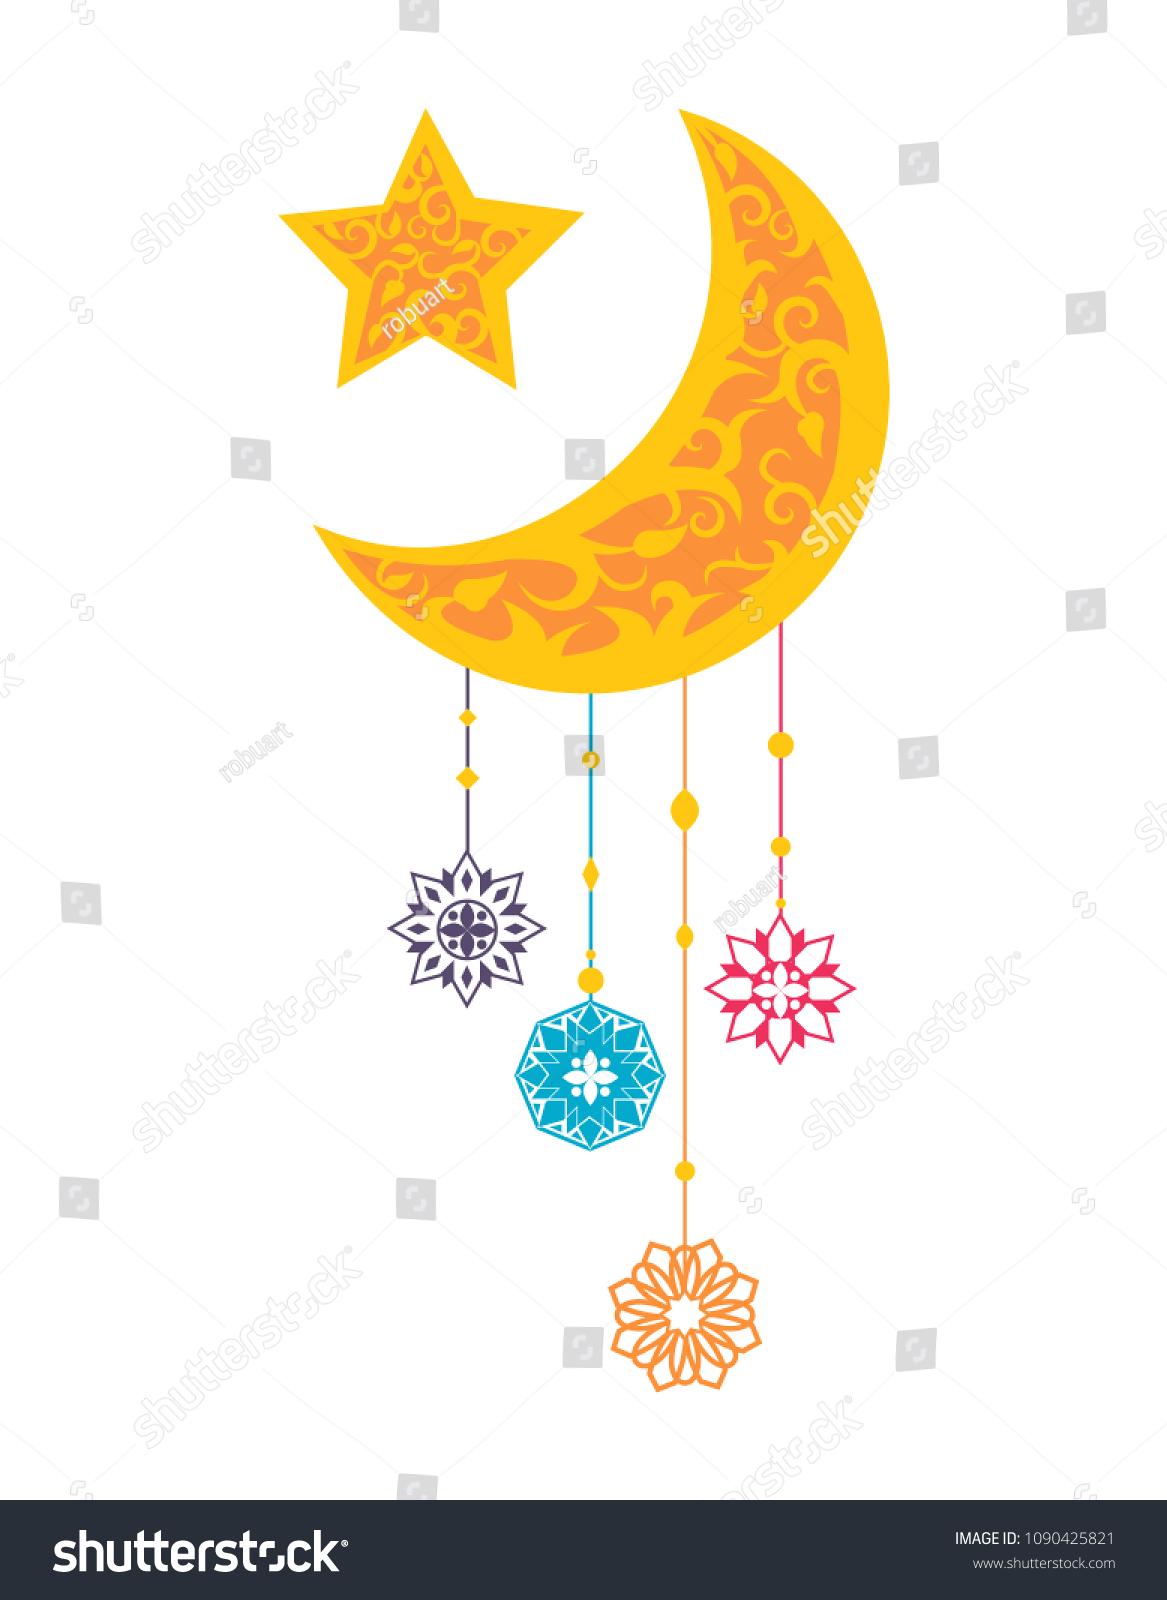 Ramadan Kareem Crescent Moon Star Internationallyrecognized Stock